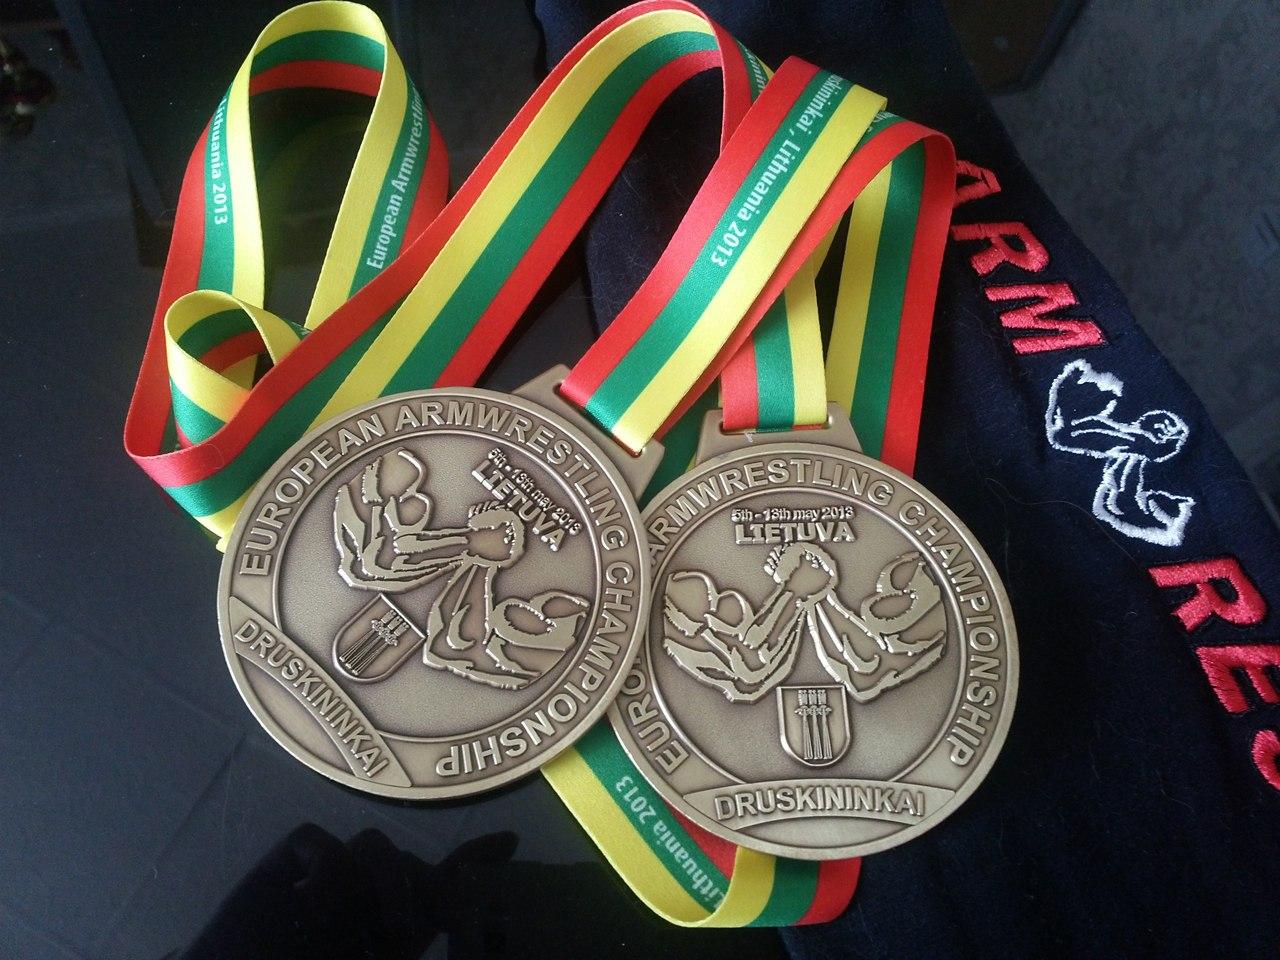 Ekaterina Nikisheva's bronze medals from the 23rd European Armwrestling Championships 2013, Druskininkai, Lithuania │ Image Source: Katerina Nikisheva